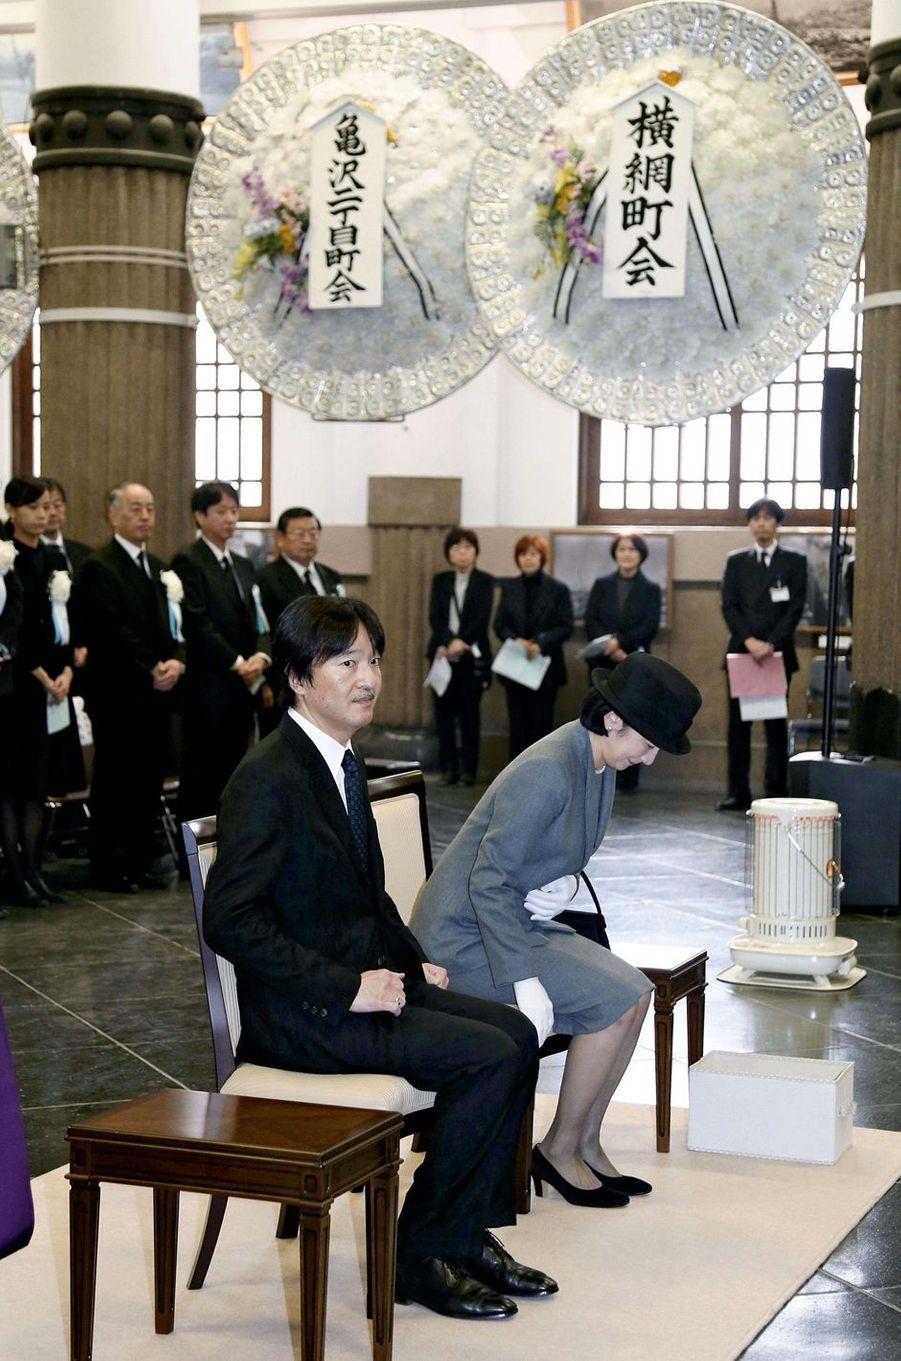 La princesse Kiko du Japon et le prince Fumihito d'Akishino à Tokyo, le 10 mars 2019